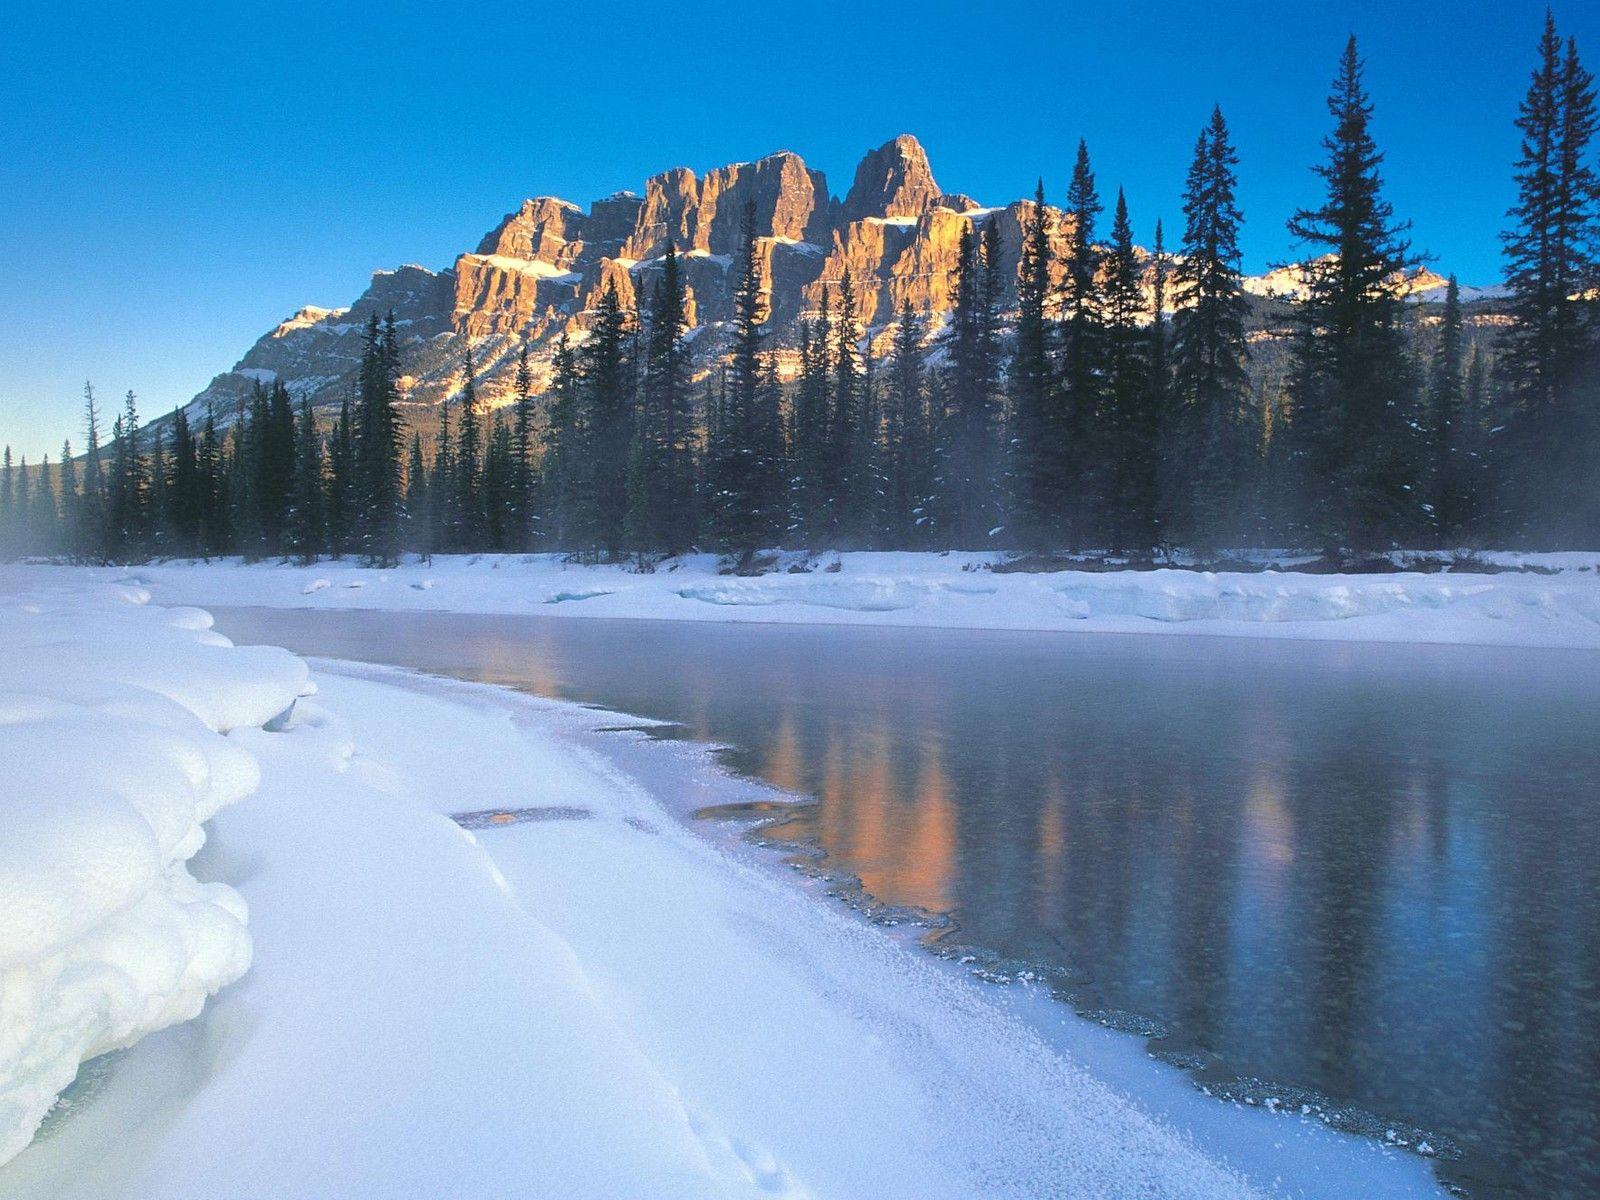 Paysages hiver for Immagini inverno sfondi